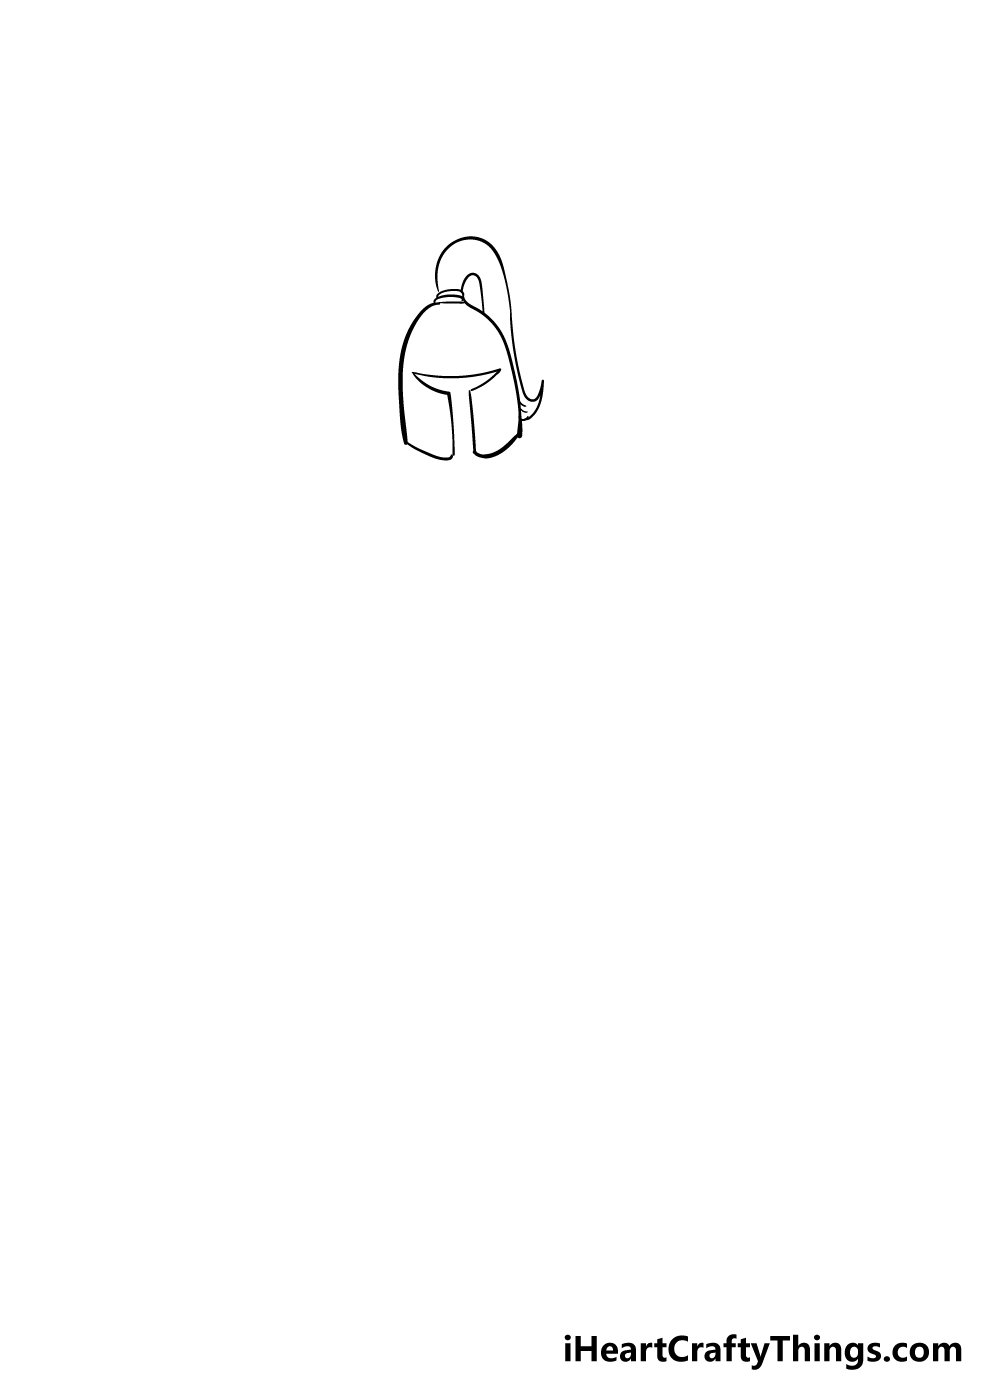 knight drawing step 1